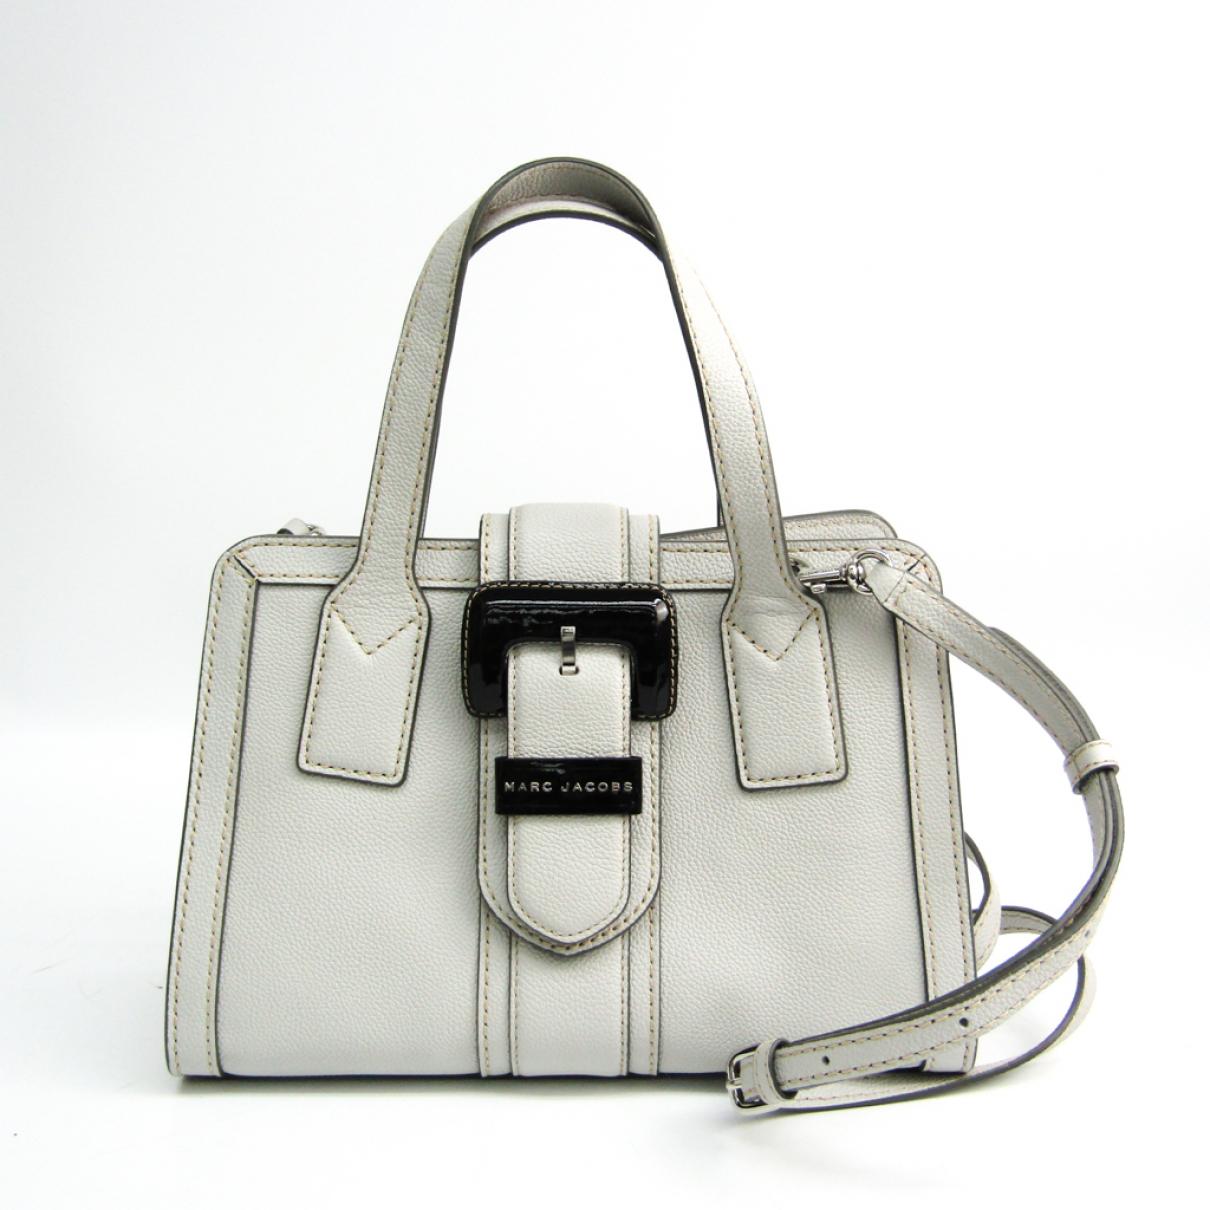 Marc By Marc Jacobs N Grey Leather handbag for Women N